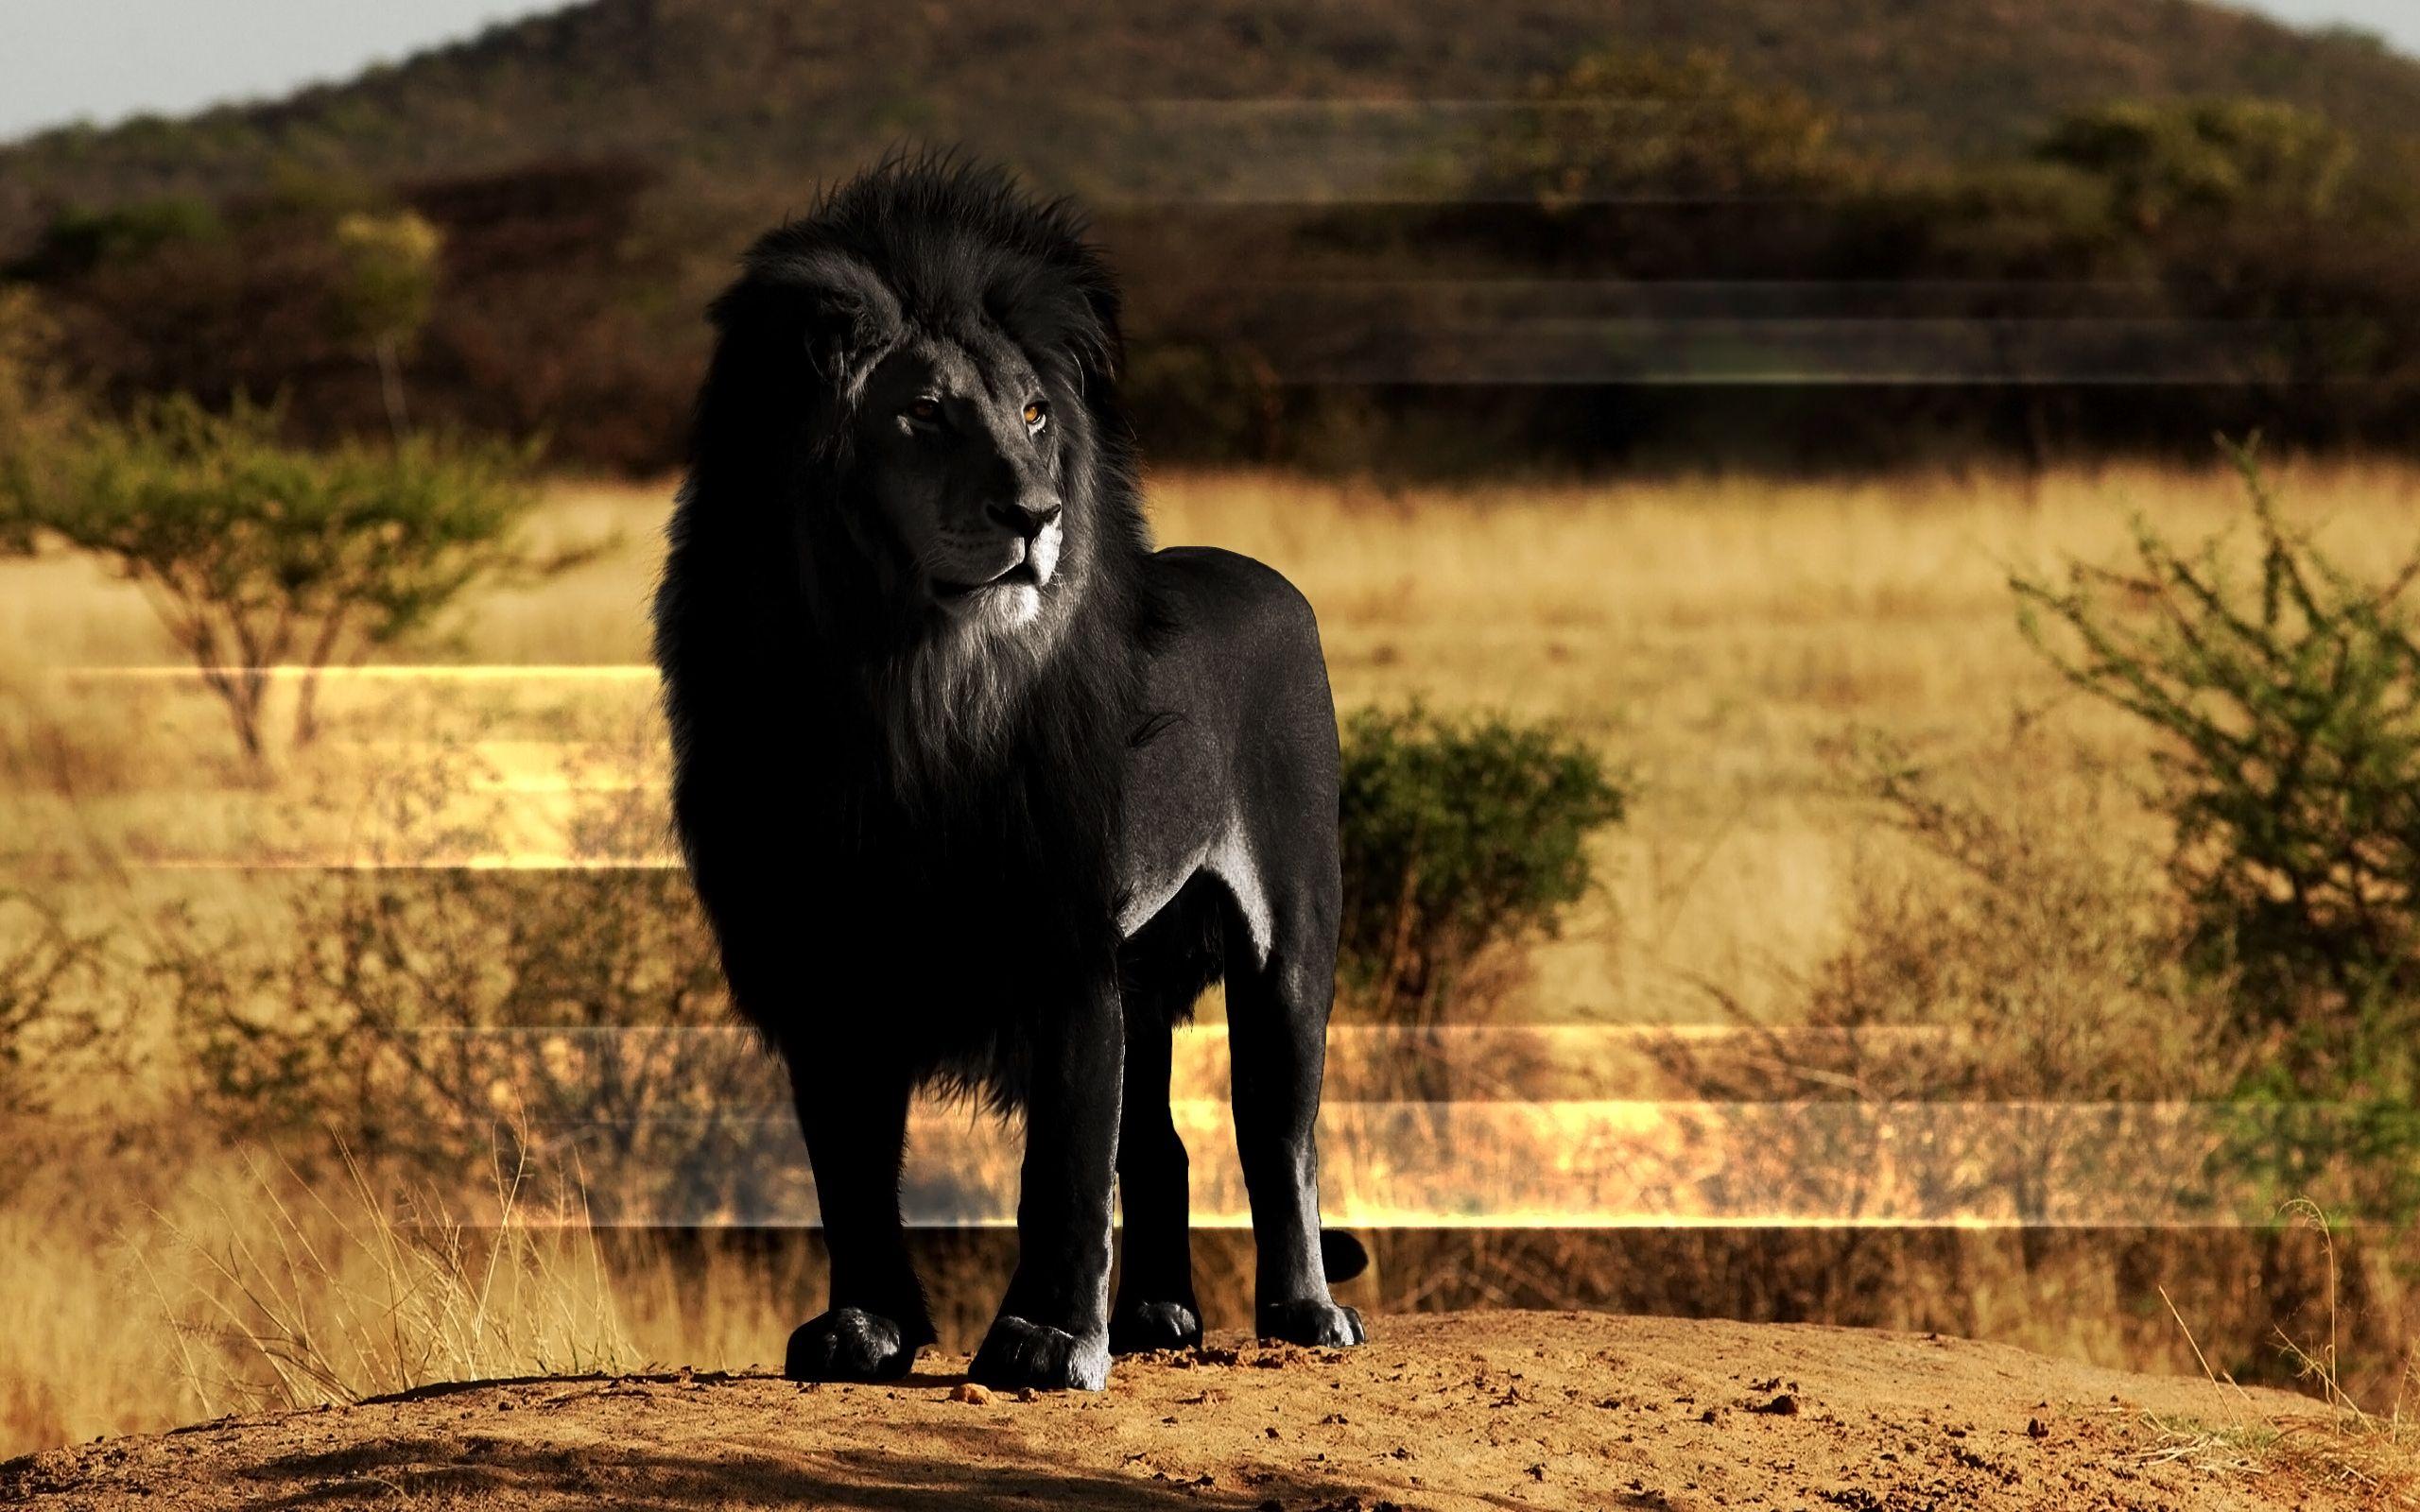 Lion Solo Highres Black Hair Standing Nose Wallpaper Melanistic Animals Albino Animals Black Lion